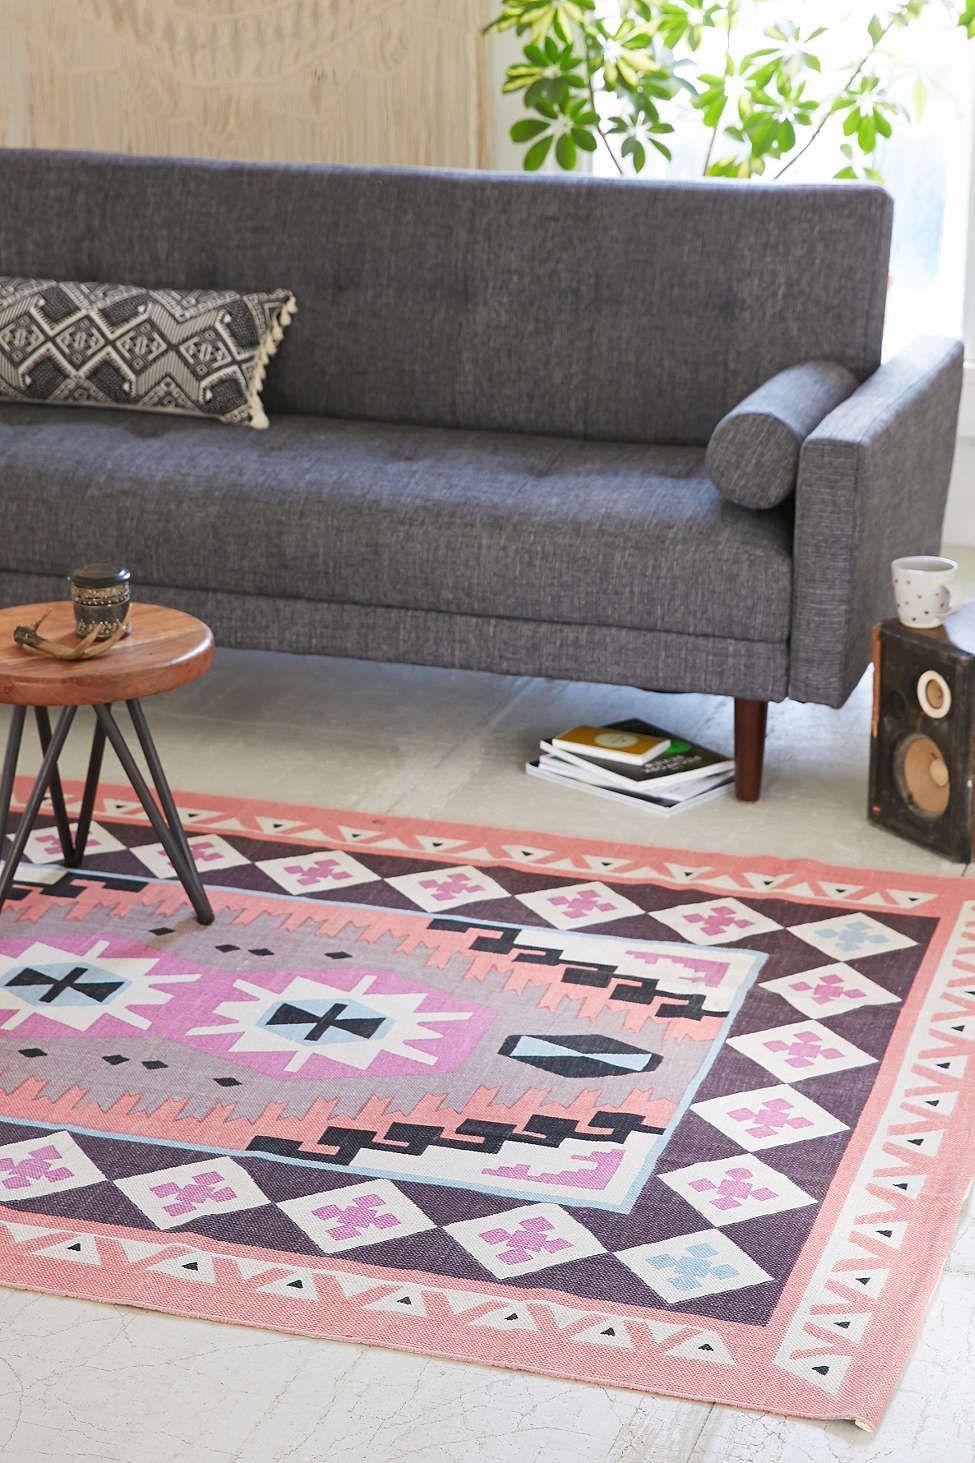 Living Room  3x5 Rugs - 8833d8de7ff52bec4cbcf852b425a340_Wonderful Living Room  3x5 Rugs - 8833d8de7ff52bec4cbcf852b425a340  Graphic_489843.jpg